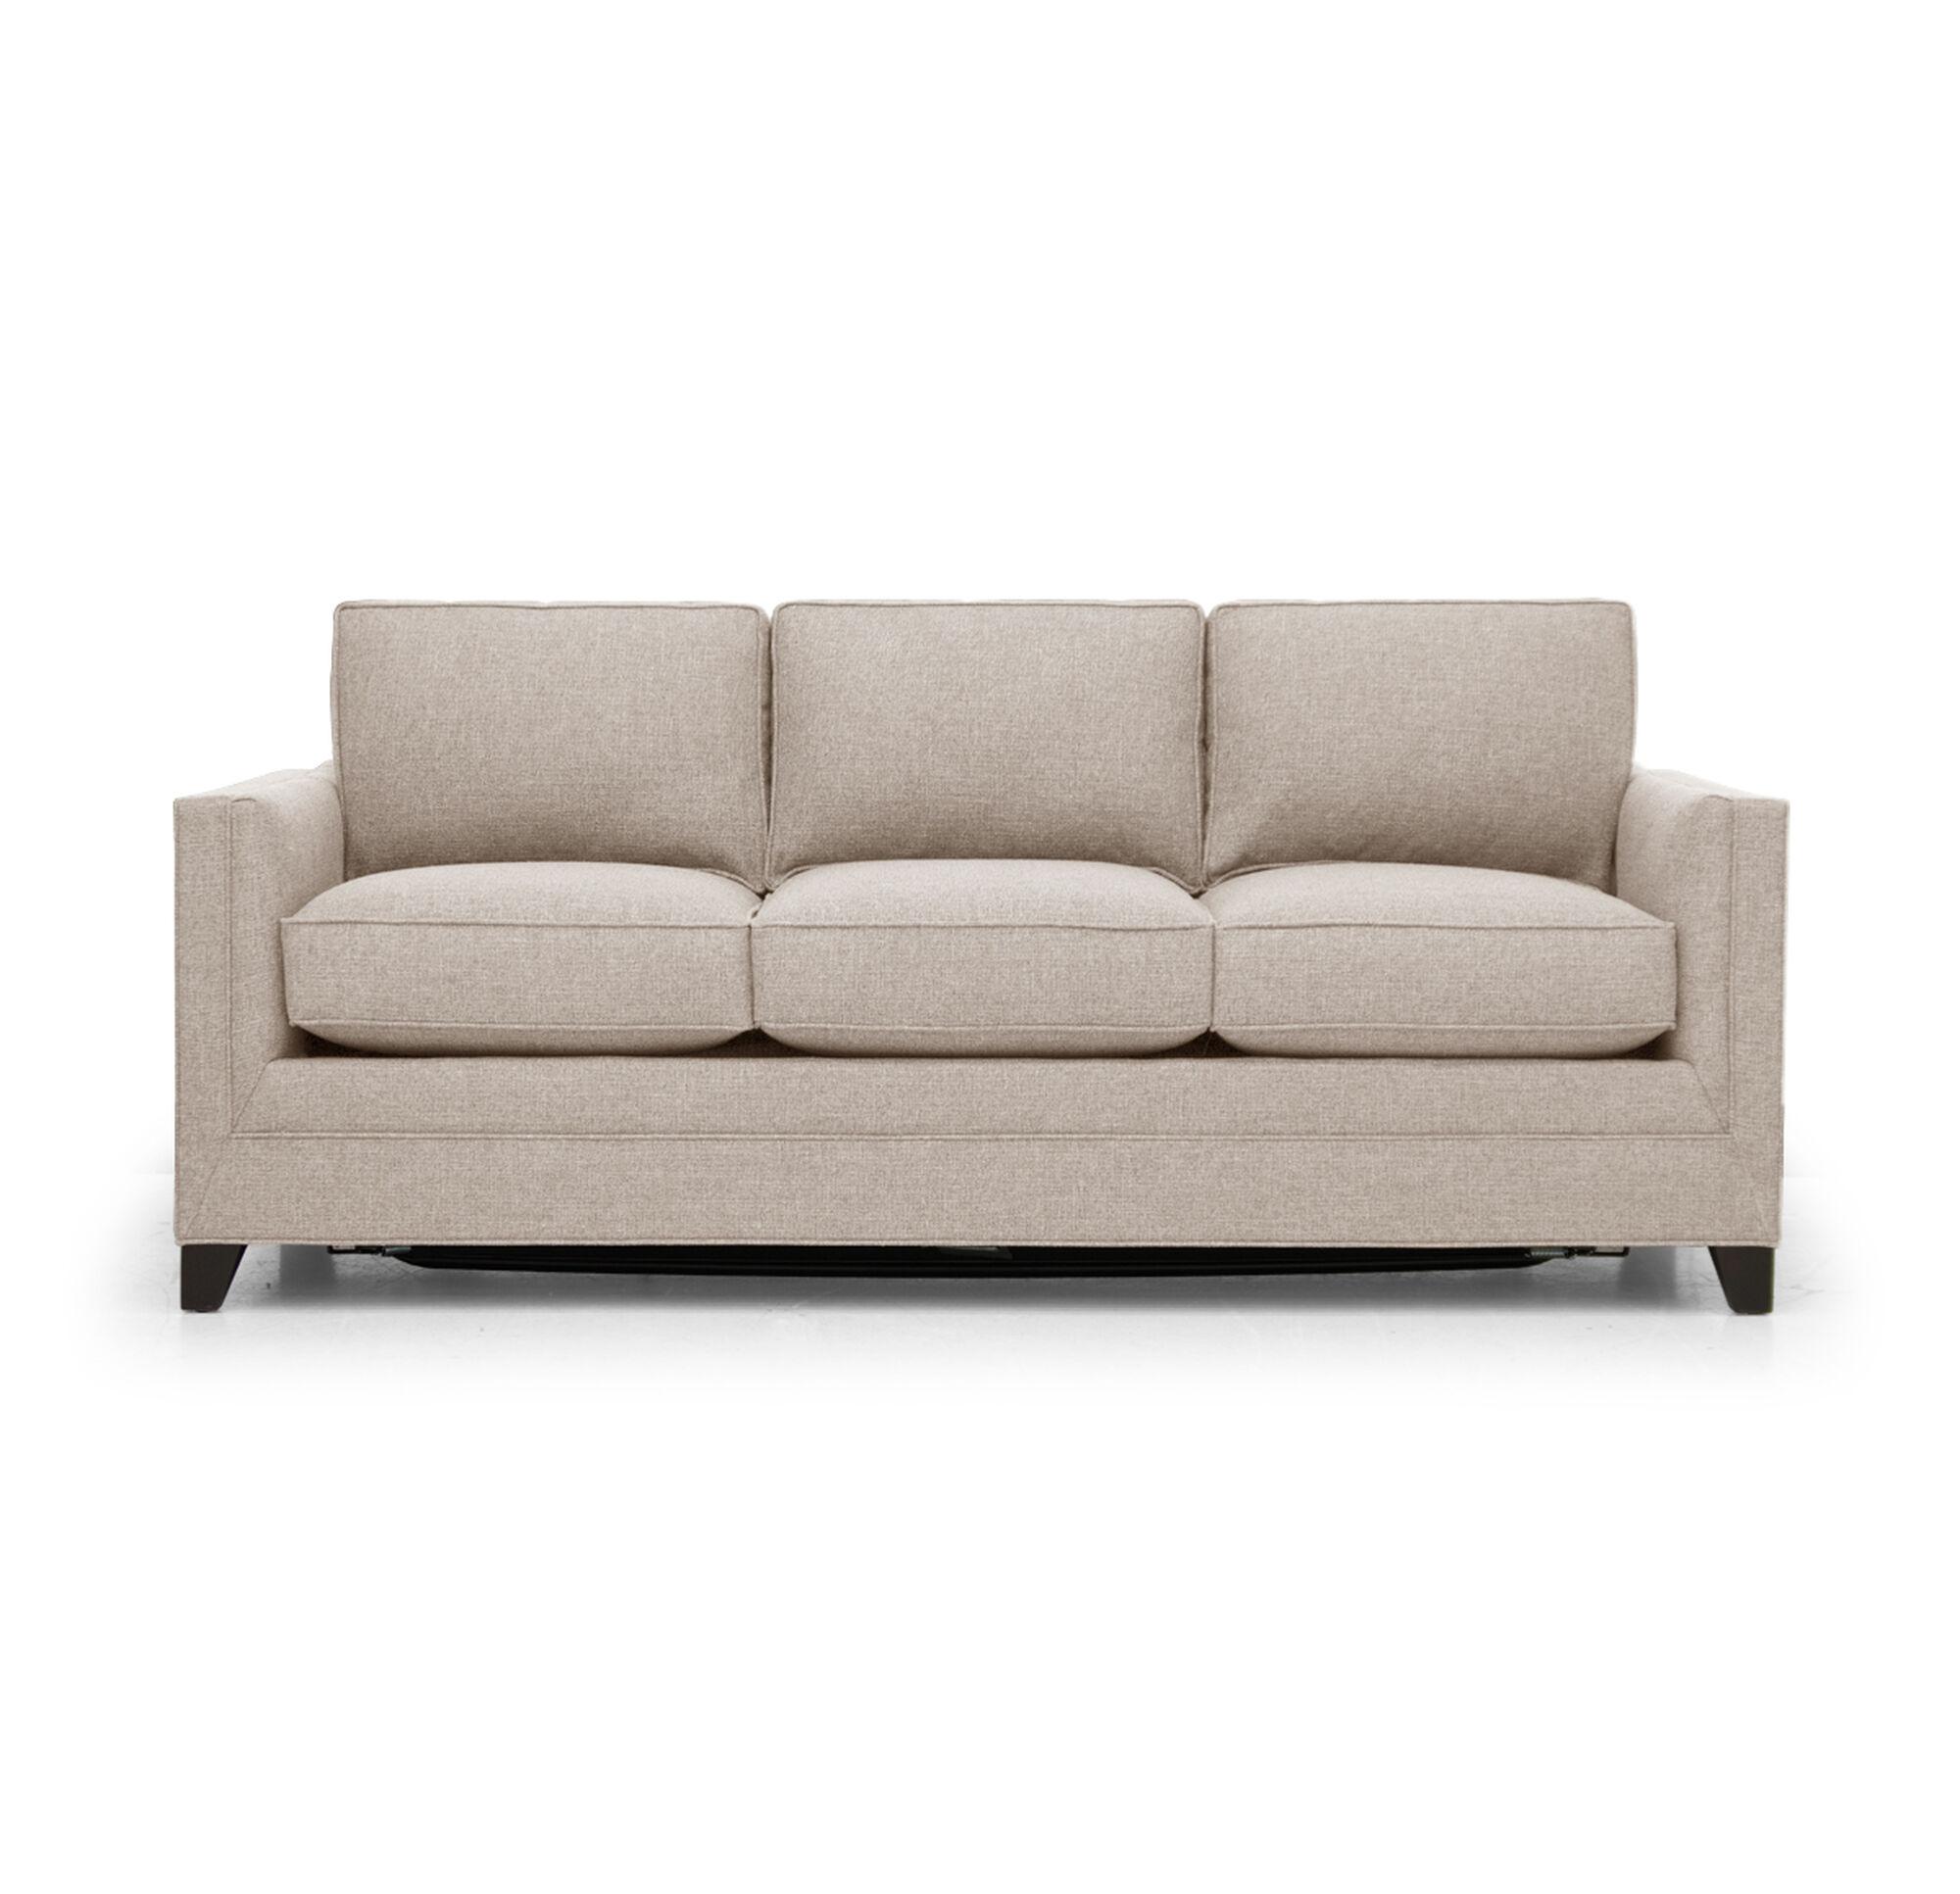 reese super luxe queen sleeper sofa. Black Bedroom Furniture Sets. Home Design Ideas